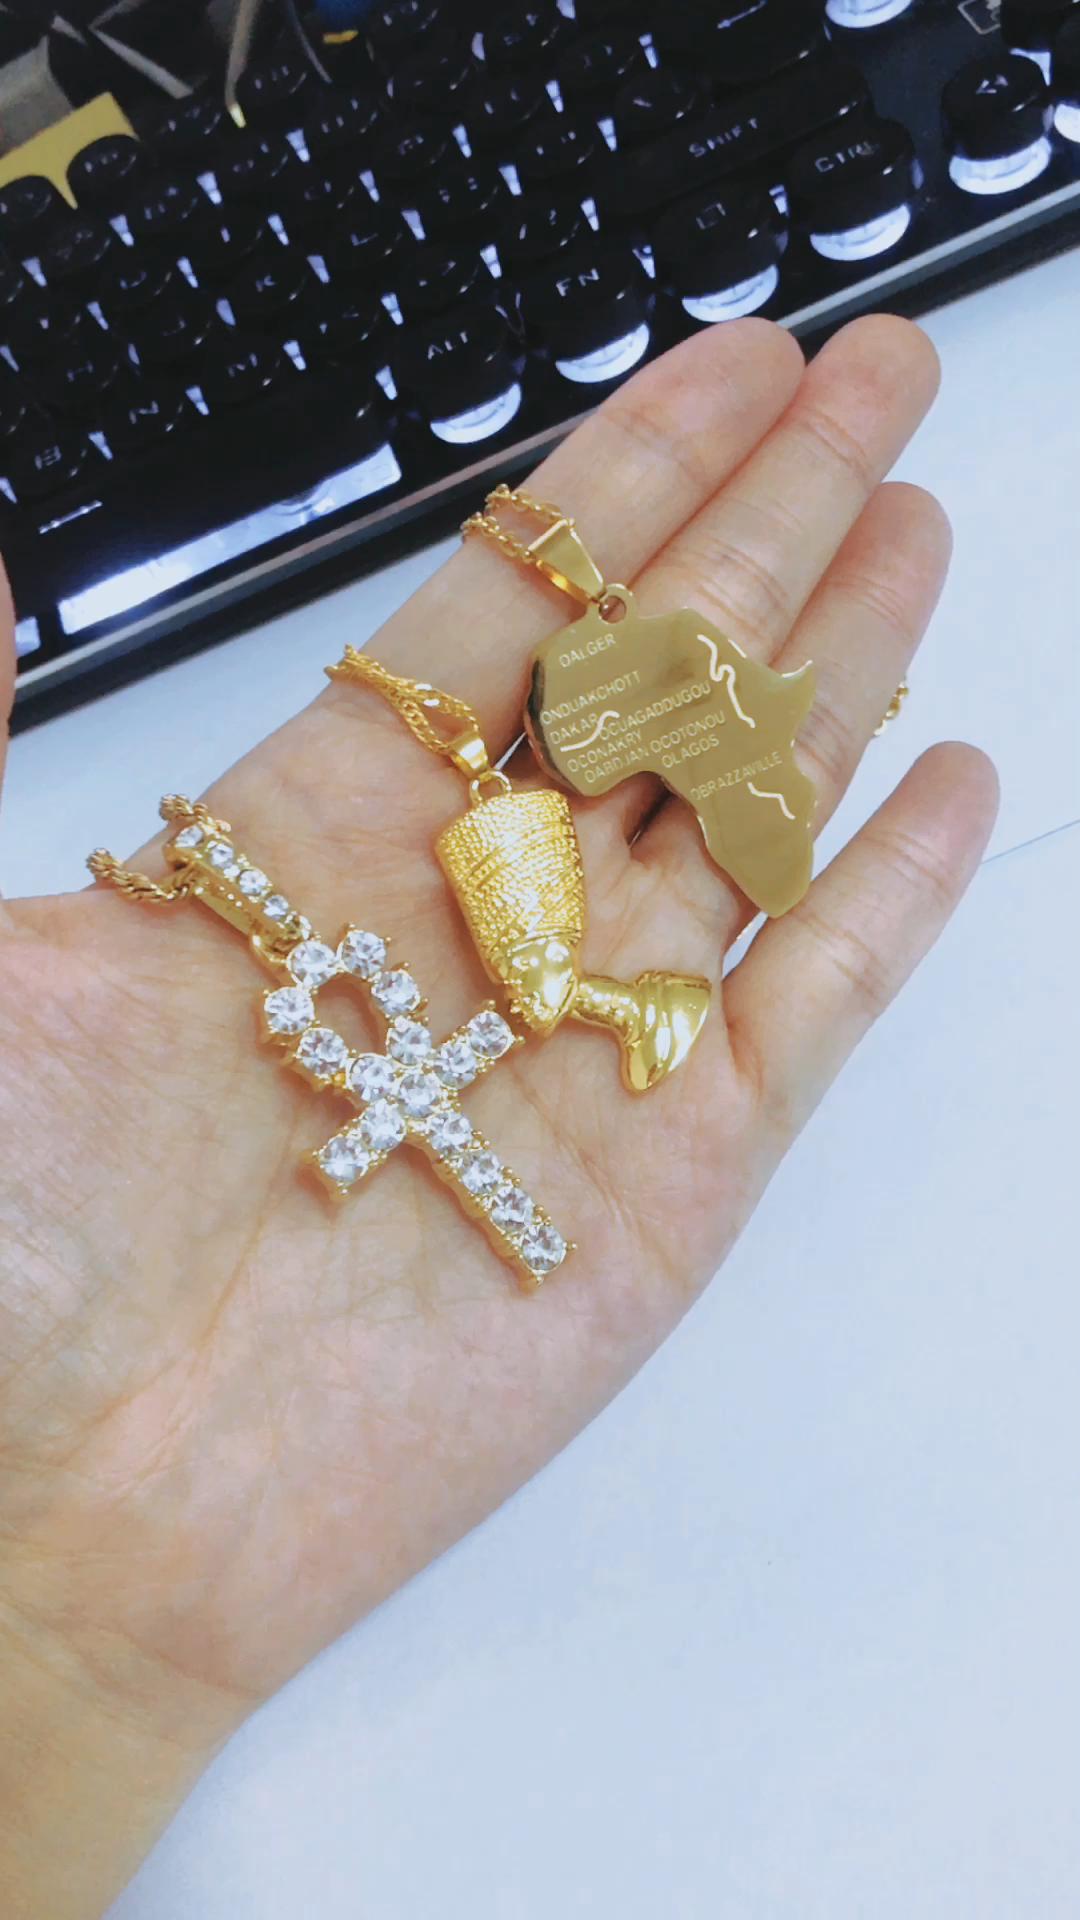 2020 Mode Liontin Kepala Firaun Mesir Perhiasan Kostum Pelat Emas Kalung Tema Fatima Mesir